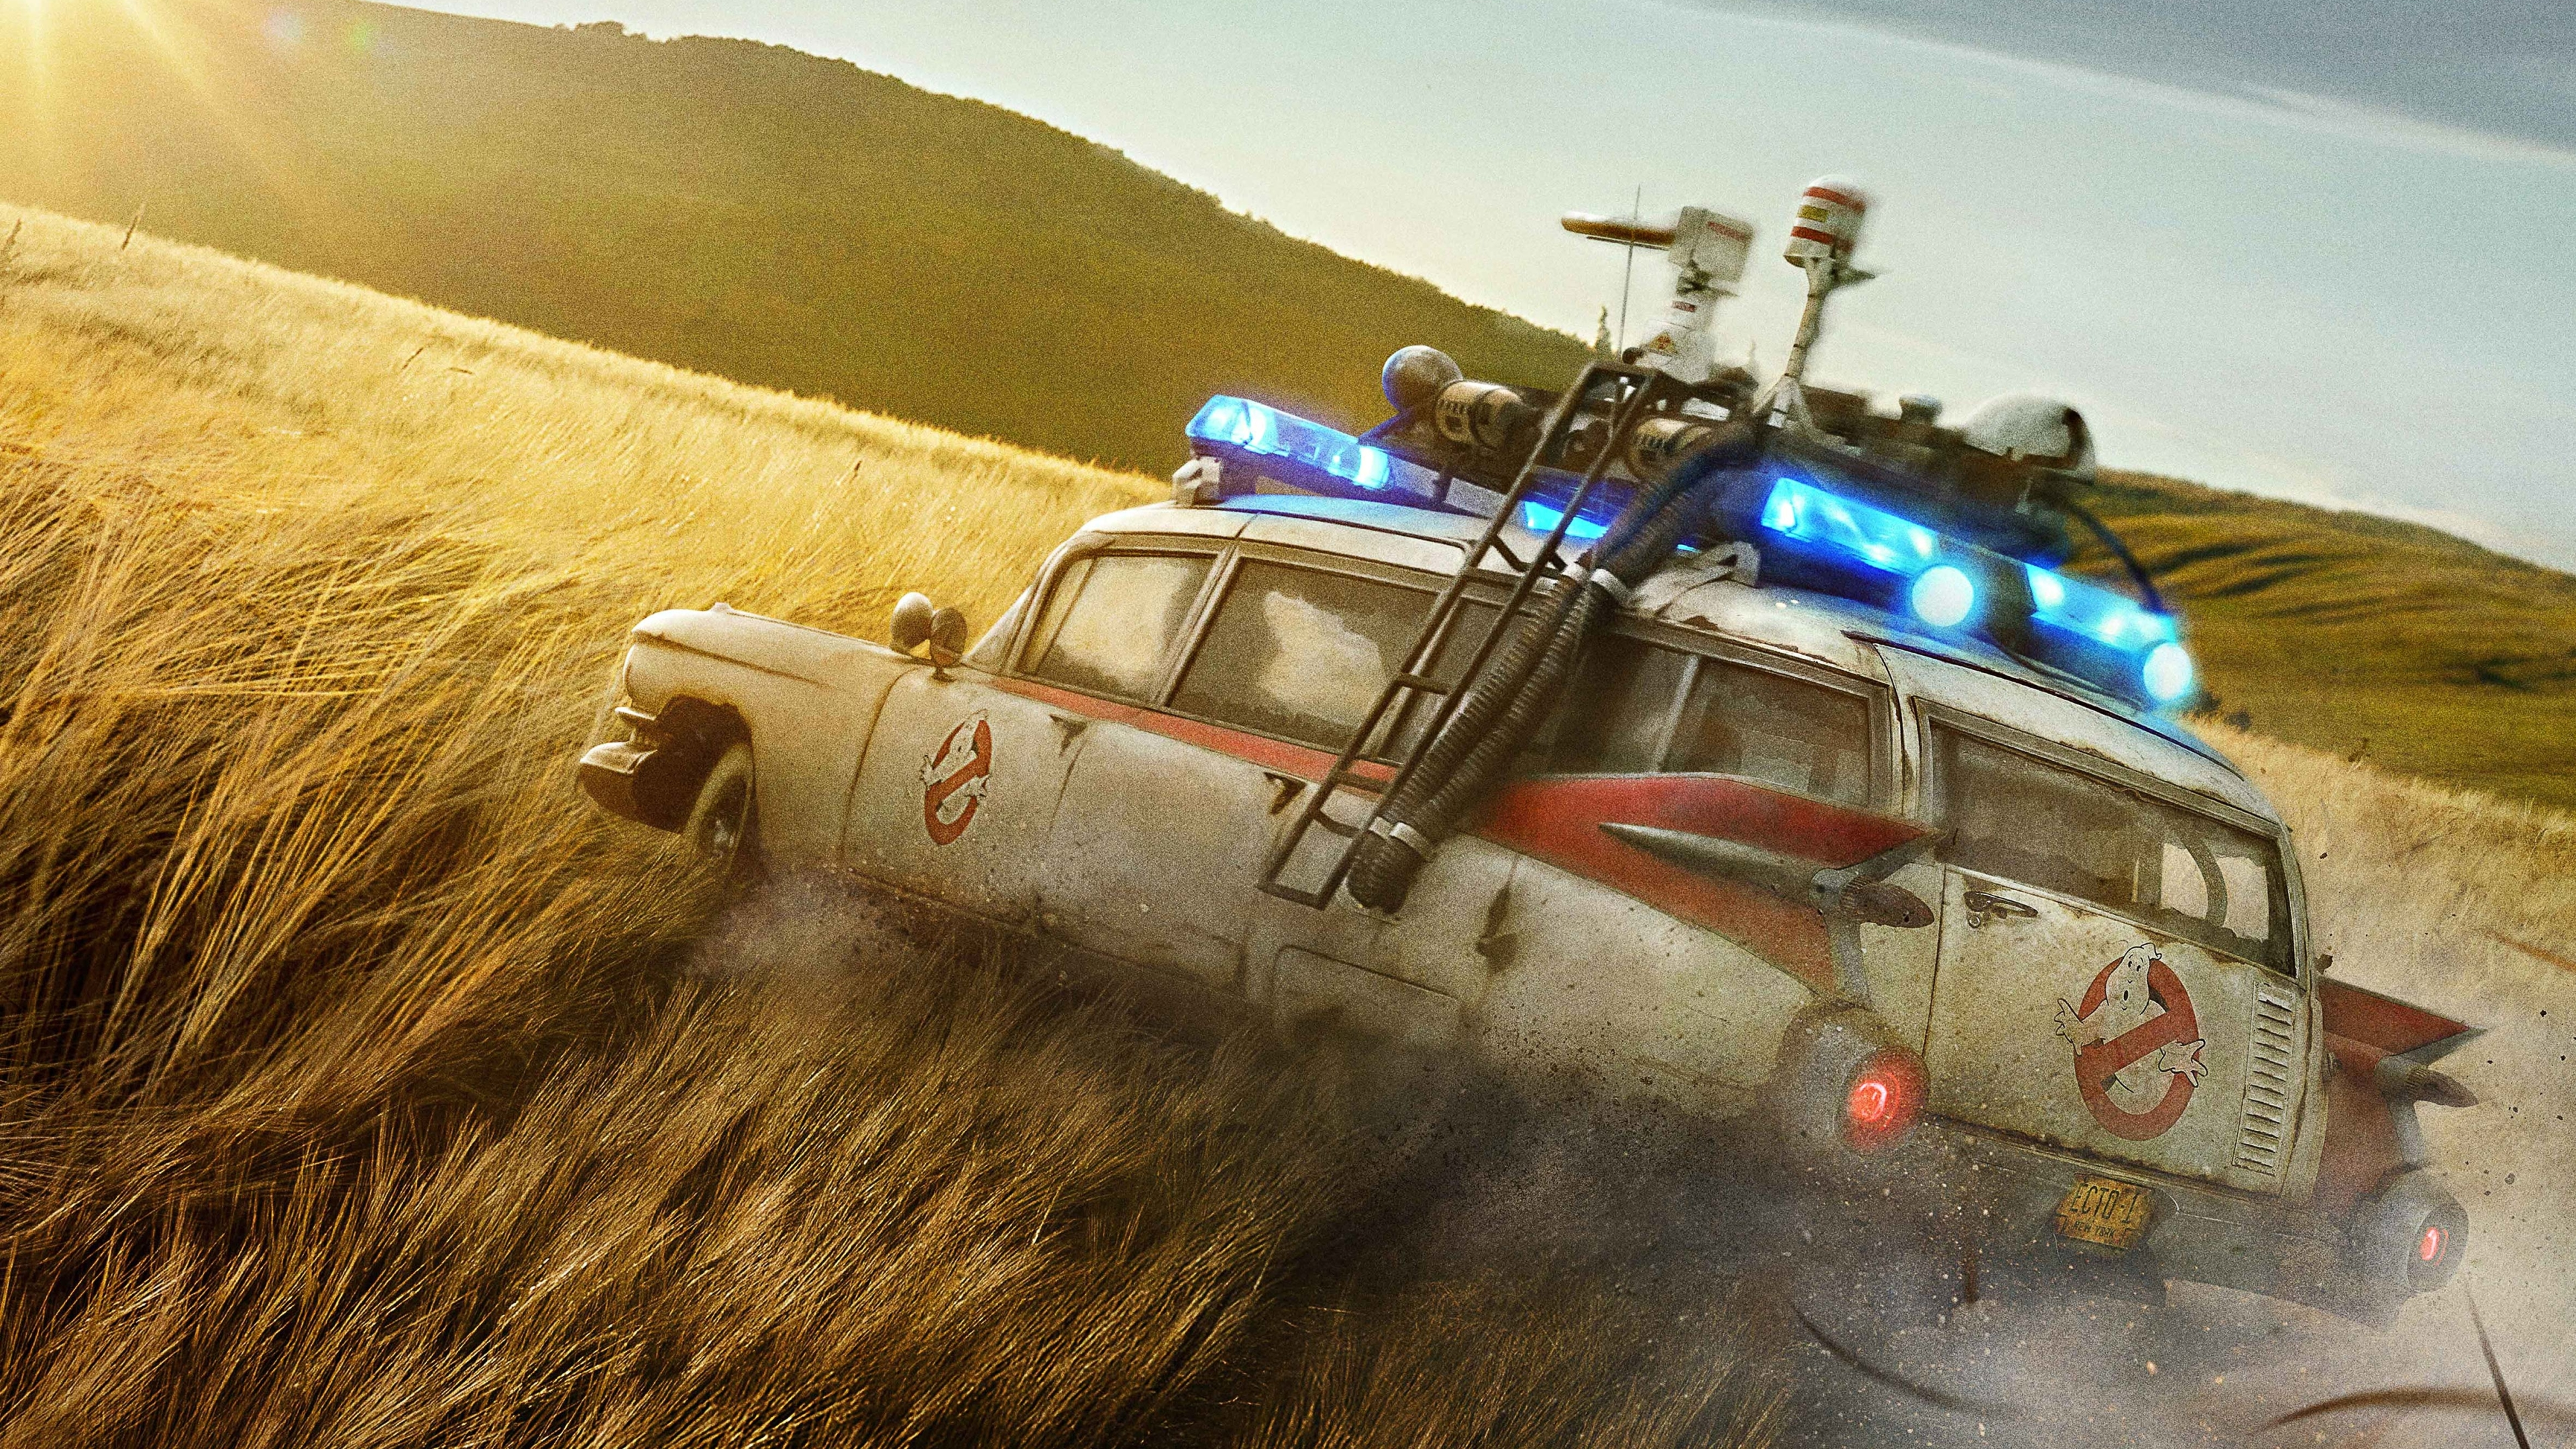 3840x2160 Ghostbusters Afterlife 2020 4K Wallpaper, HD ...